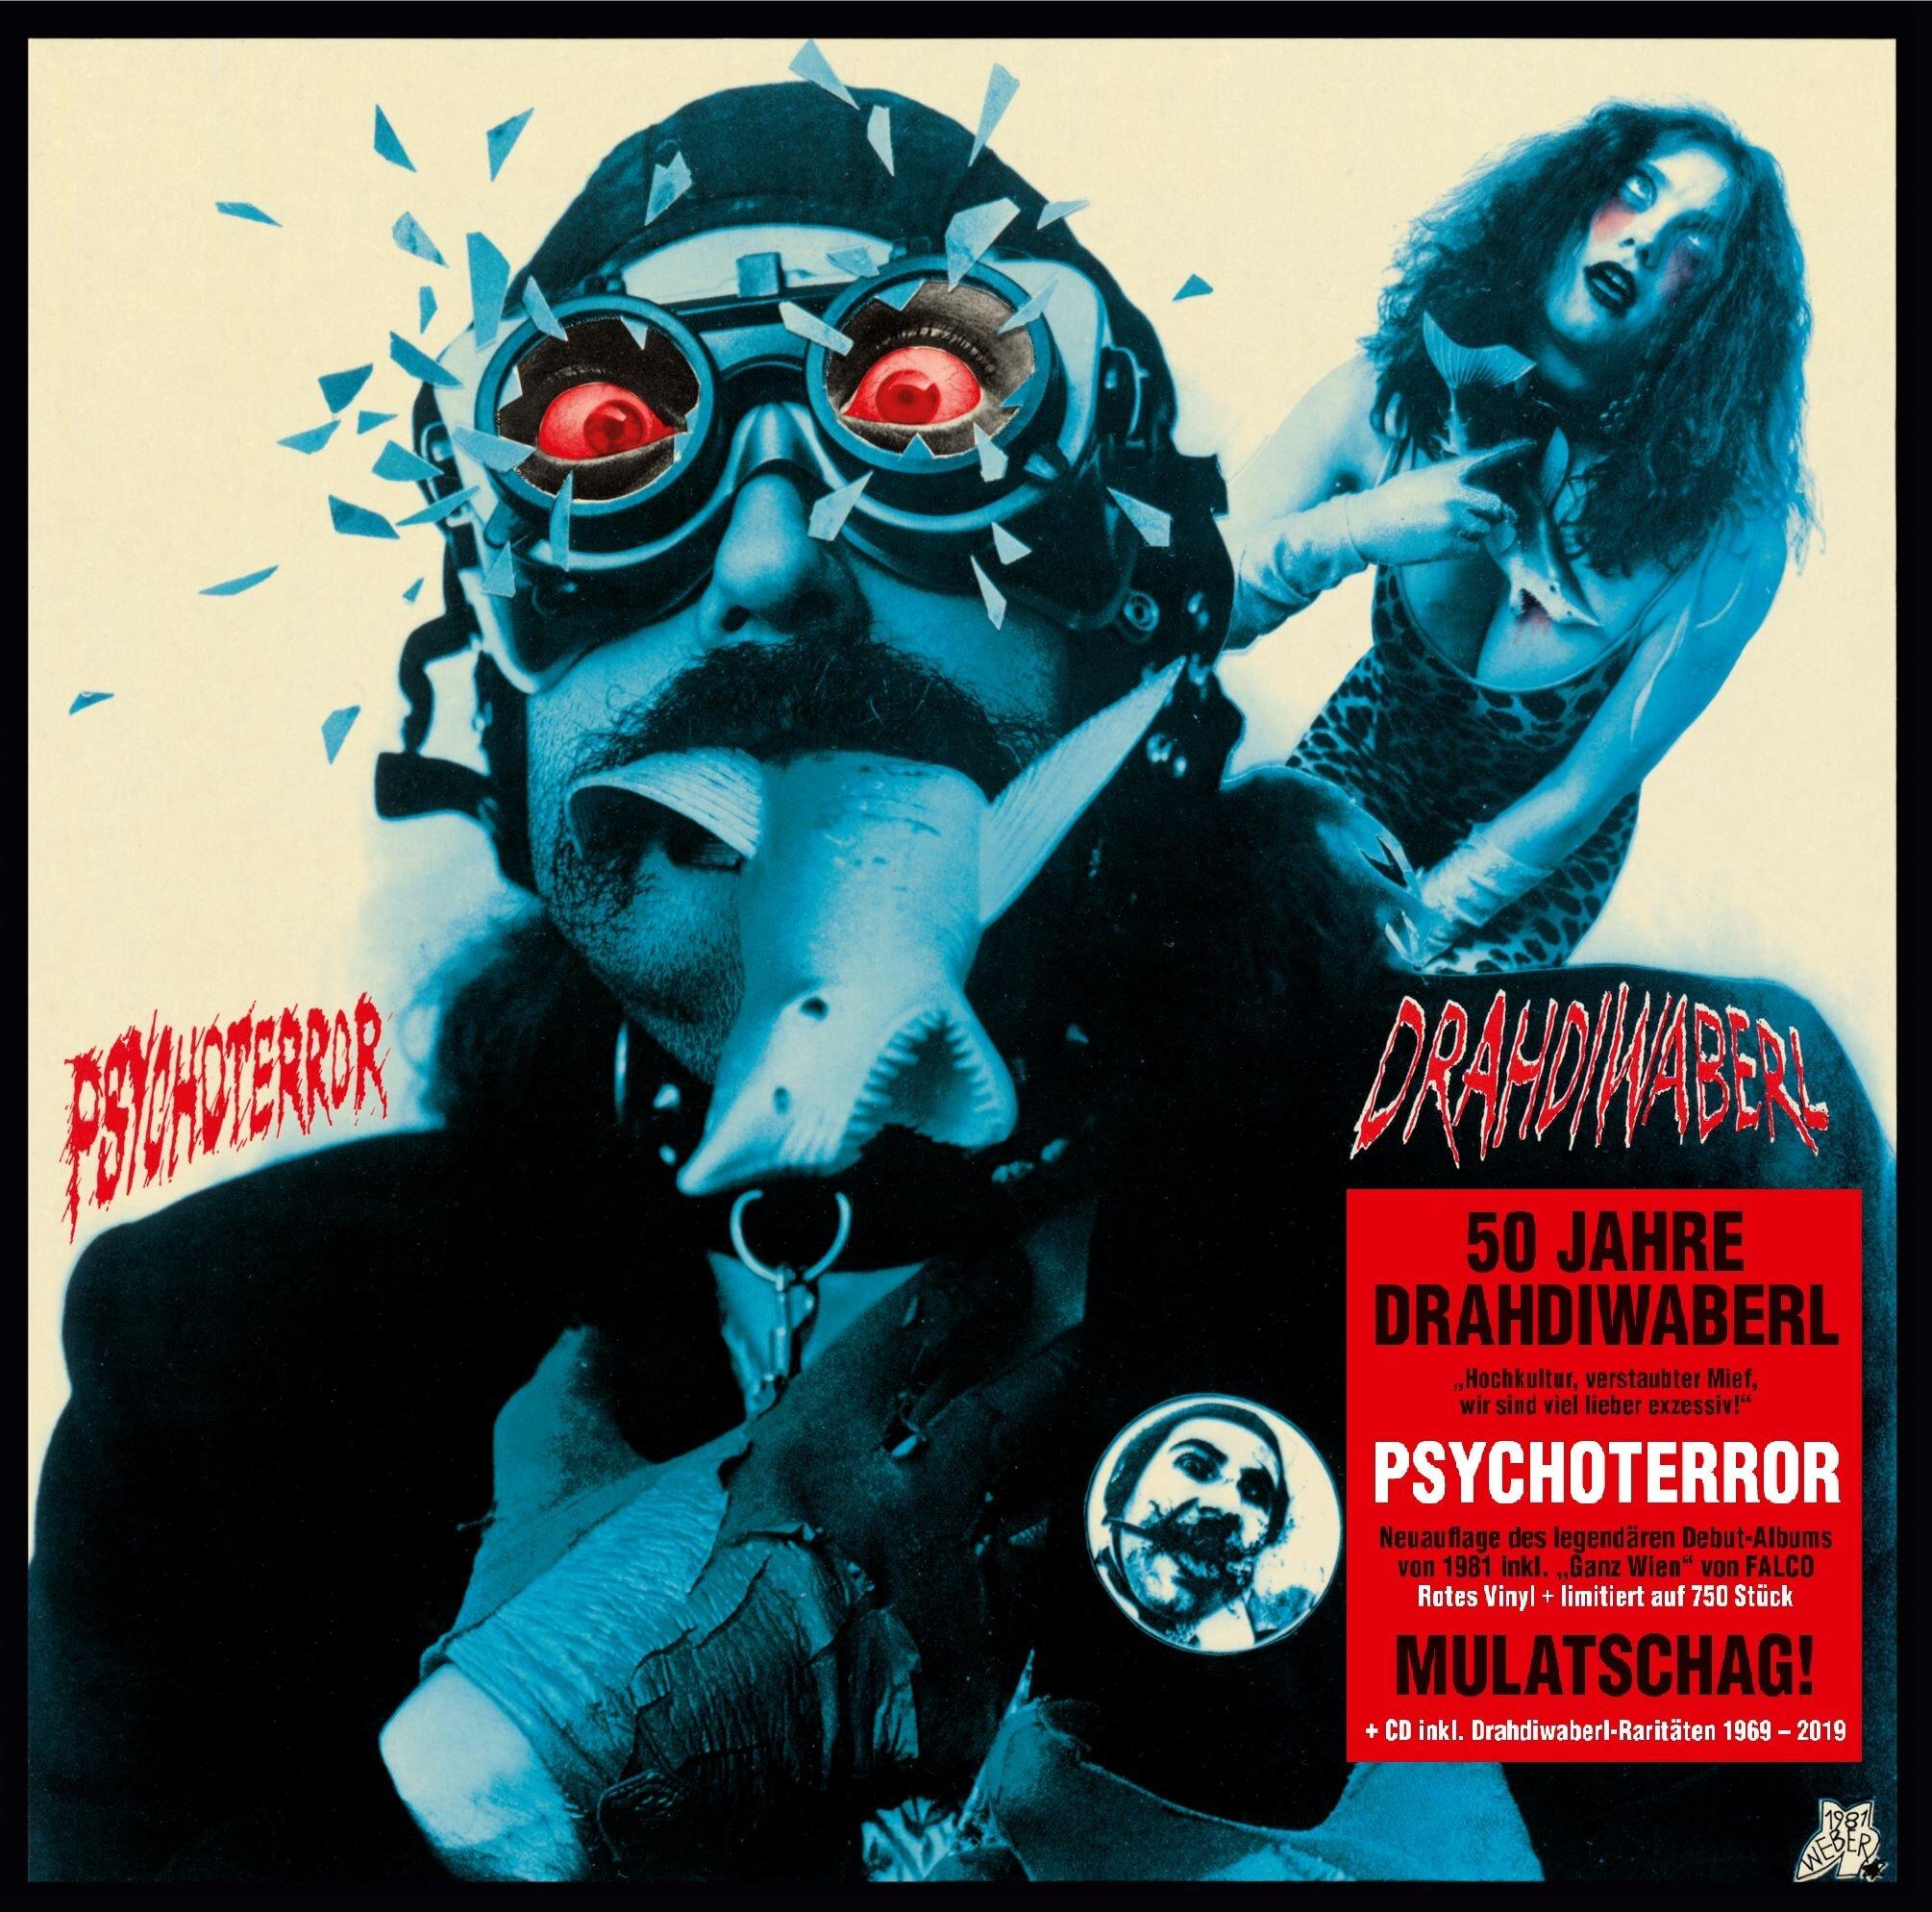 Psychoterror_2019.jpg